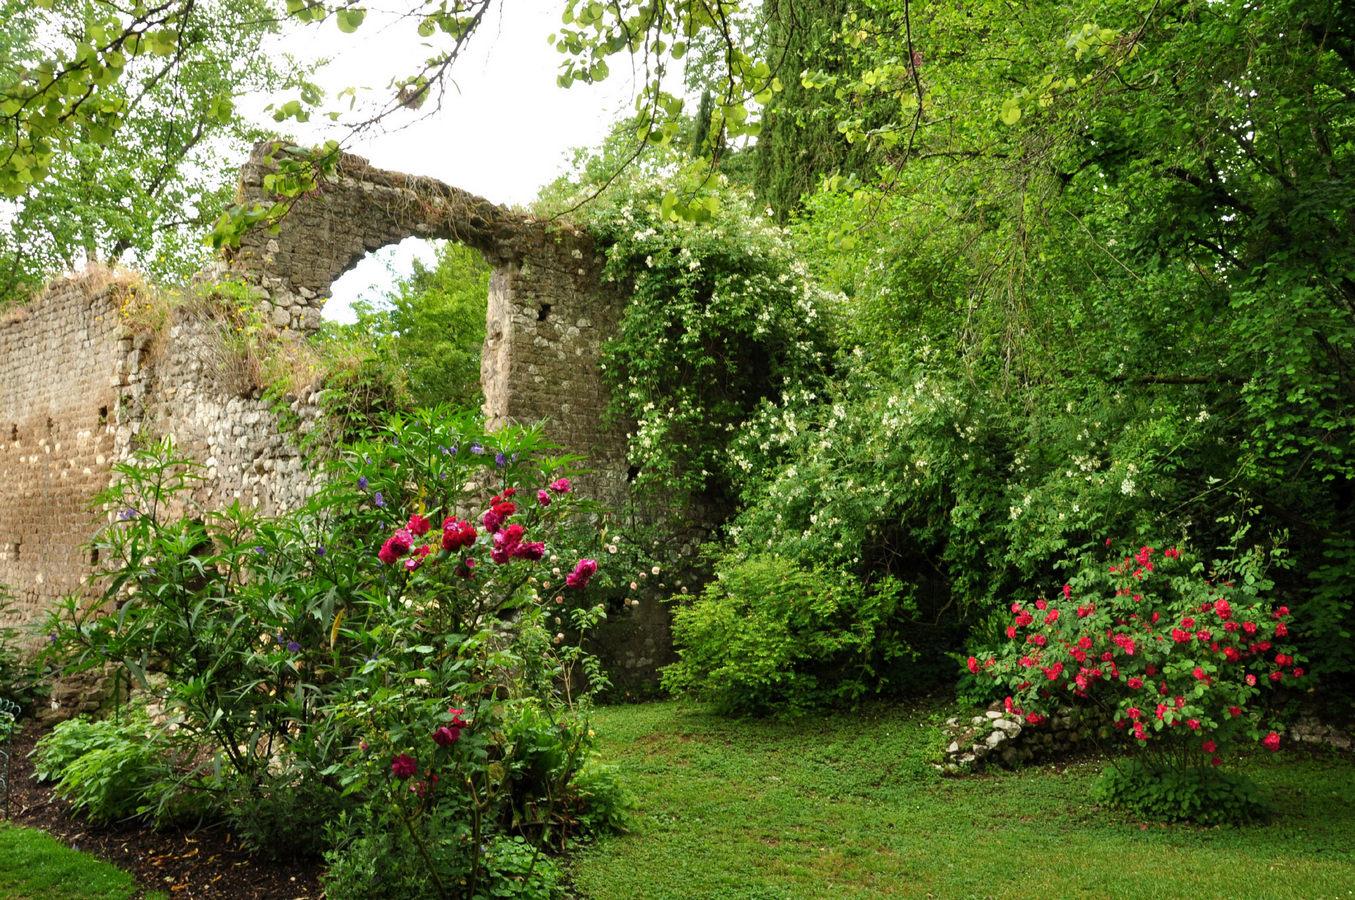 Giardino di Ninfa (Doganella) Italпy 1535075608(www.brodyaga.com).jpg